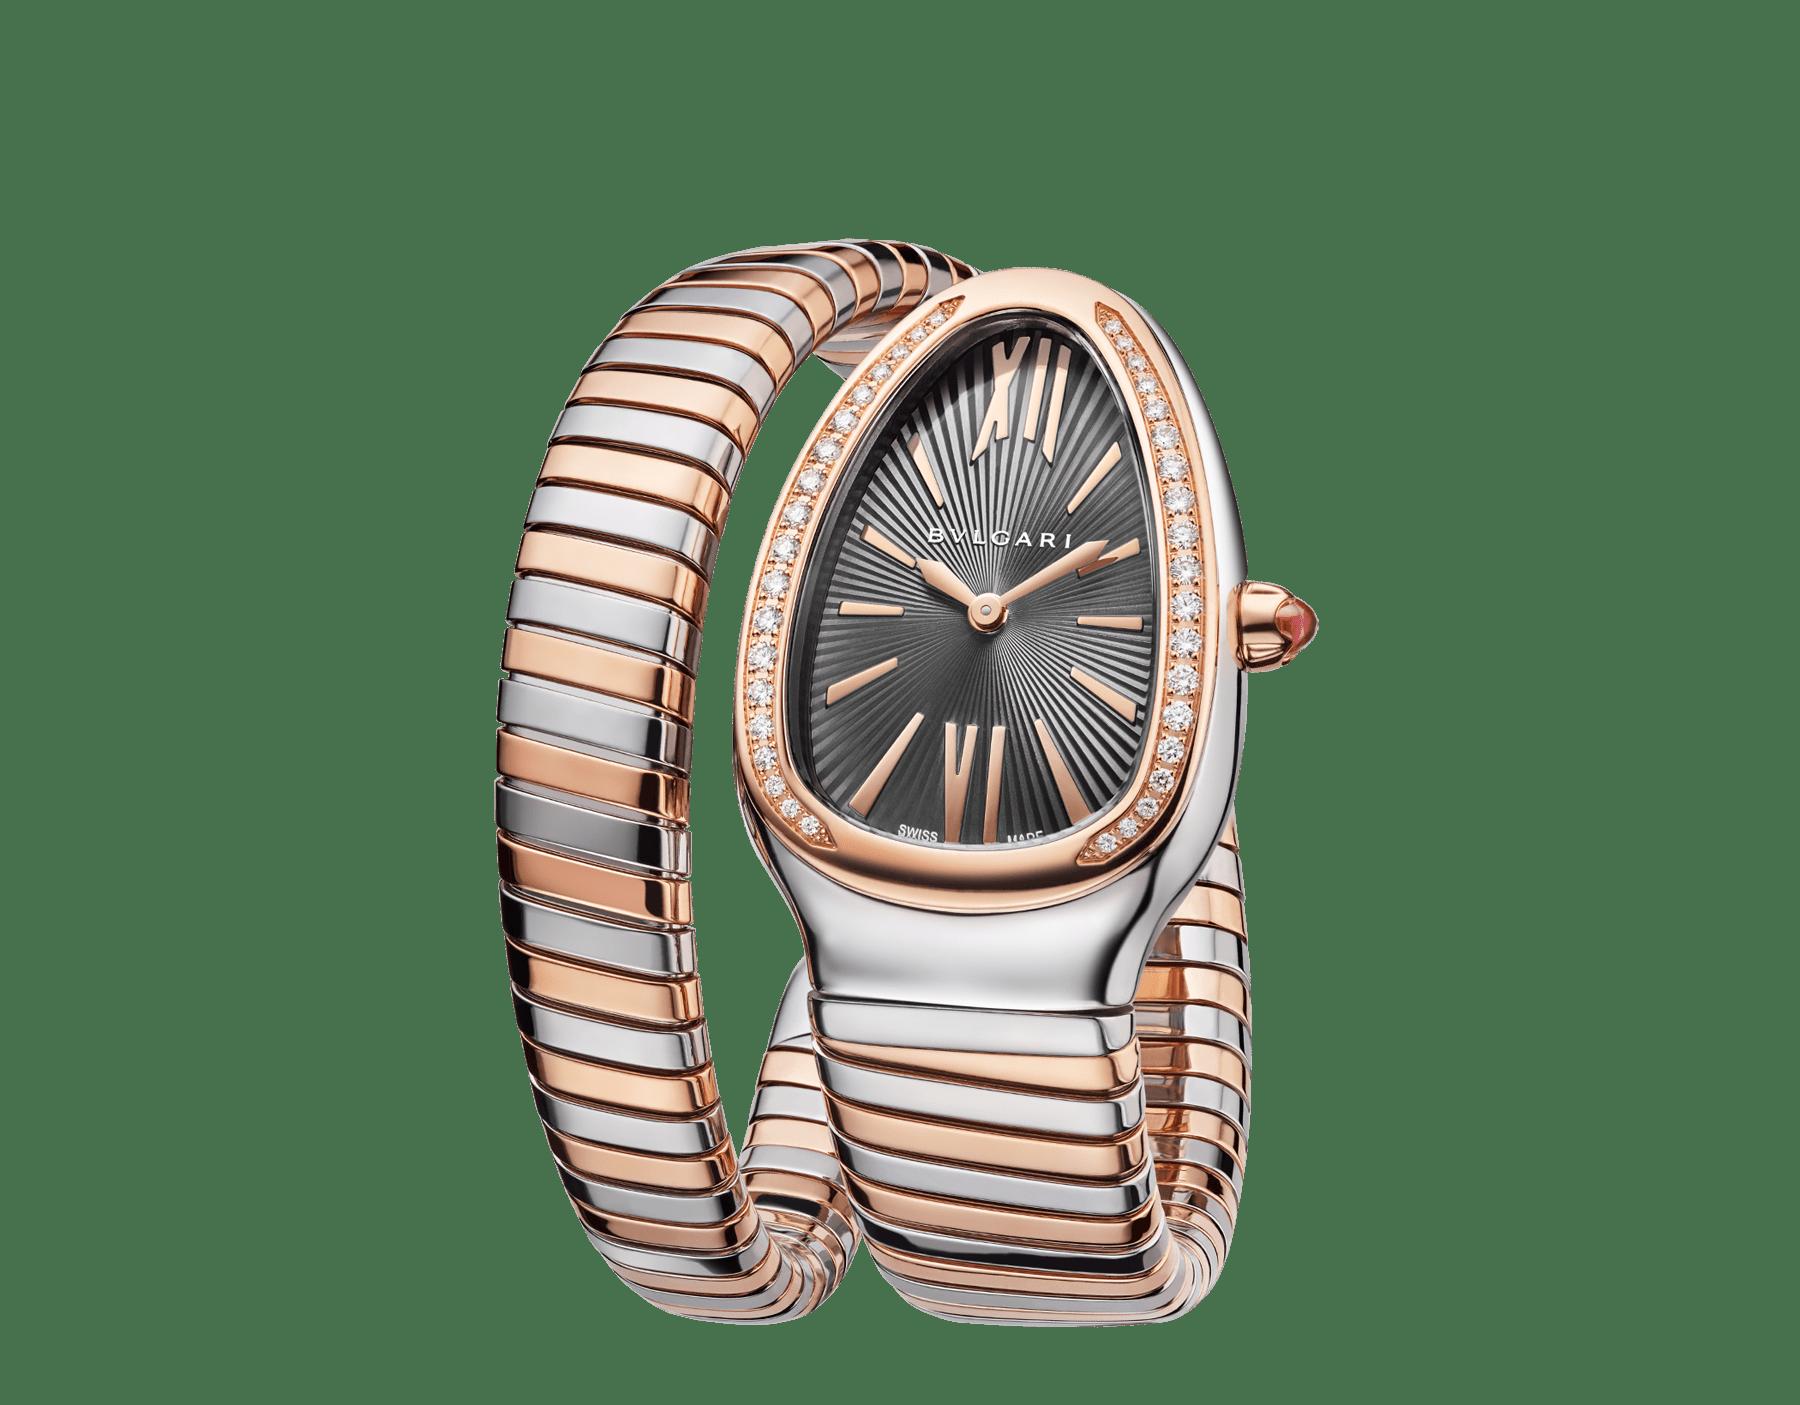 Serpenti Tubogas 單圈螺旋腕錶,精鋼錶殼,18K 玫瑰金錶圈鑲飾明亮型切割鑽石,灰色漆面錶盤,18K 玫瑰金和精鋼錶帶。 102681 image 2